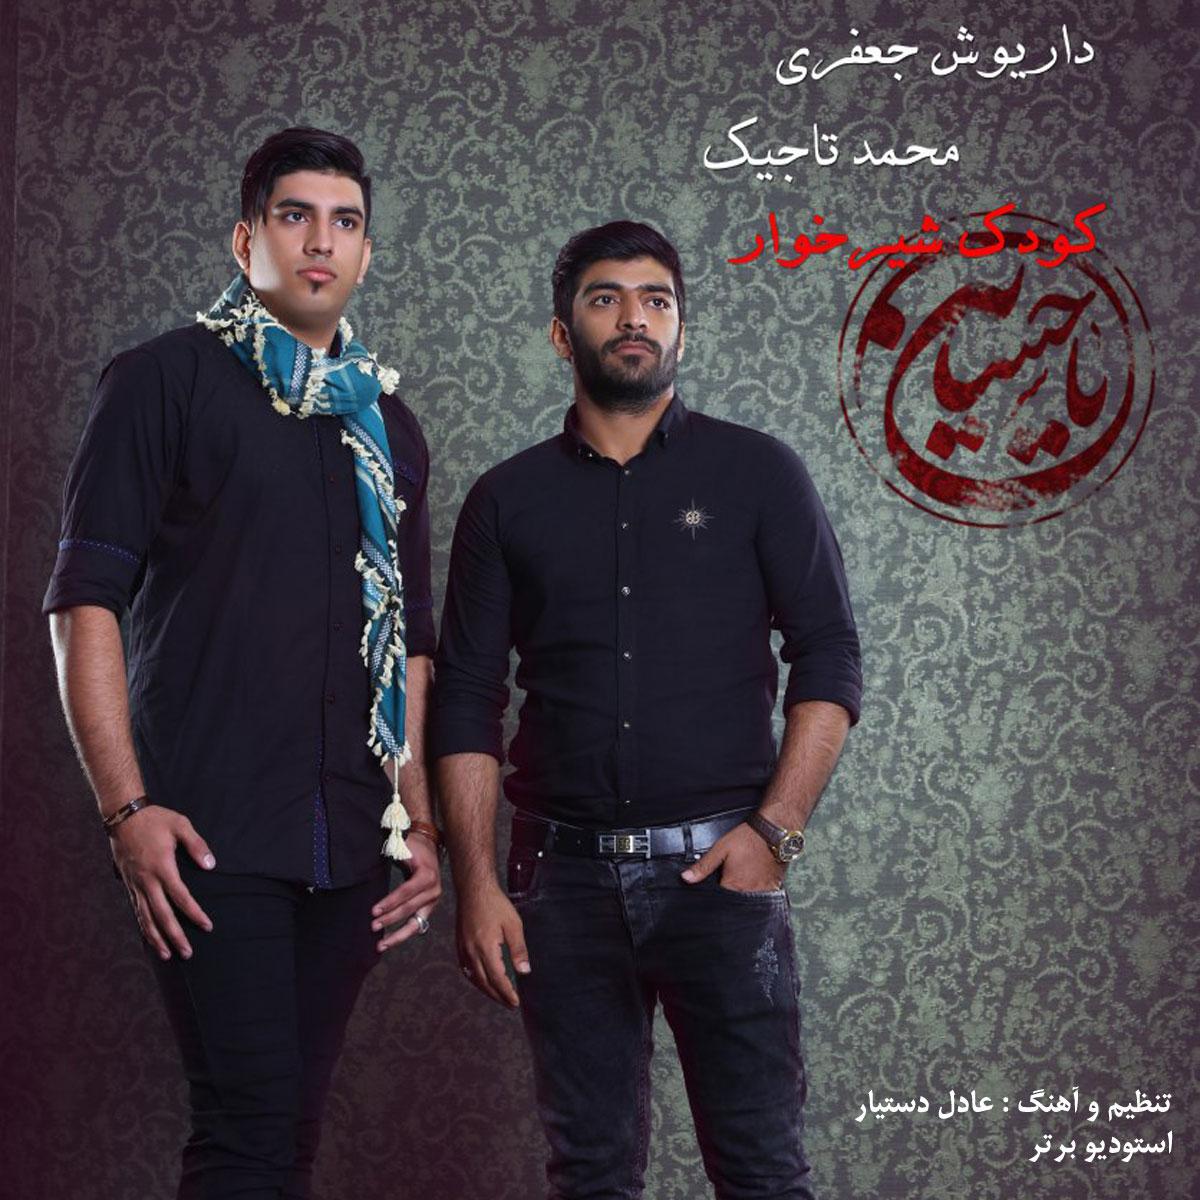 Dariuosh Jafari&Mohammad Tajik – Kodake Shi Khar